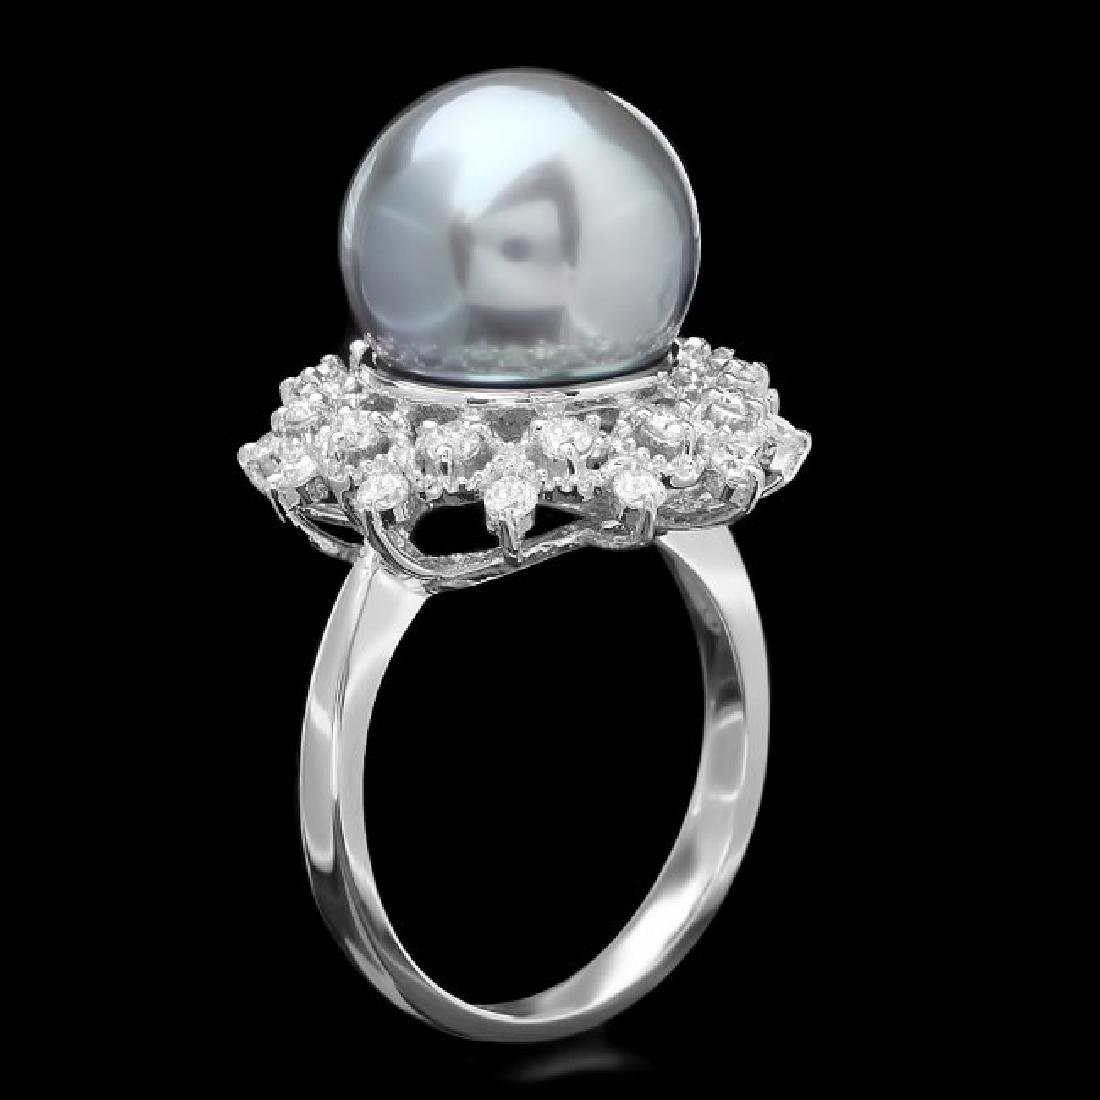 14k Gold 12 X 12mm Pearl 0.60ct Diamond Ring - 2